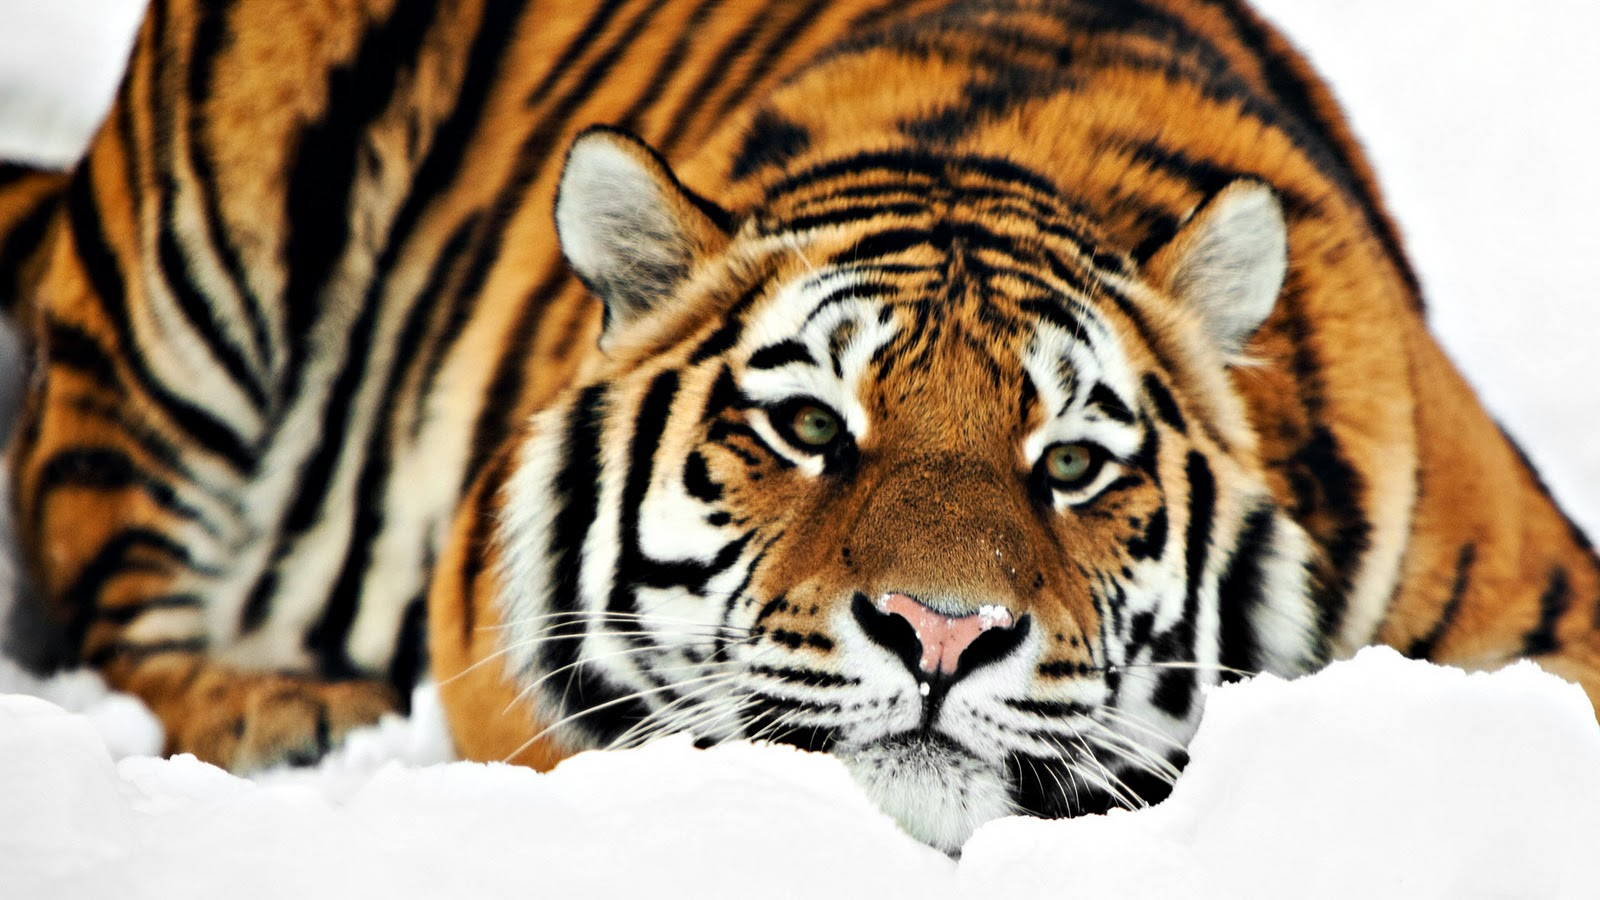 http://2.bp.blogspot.com/_H8M1zby0QoU/TPW1NXaovRI/AAAAAAAAAEo/-PQFnHXc24A/s1600/tiger_hd_1080p-HD.jpg